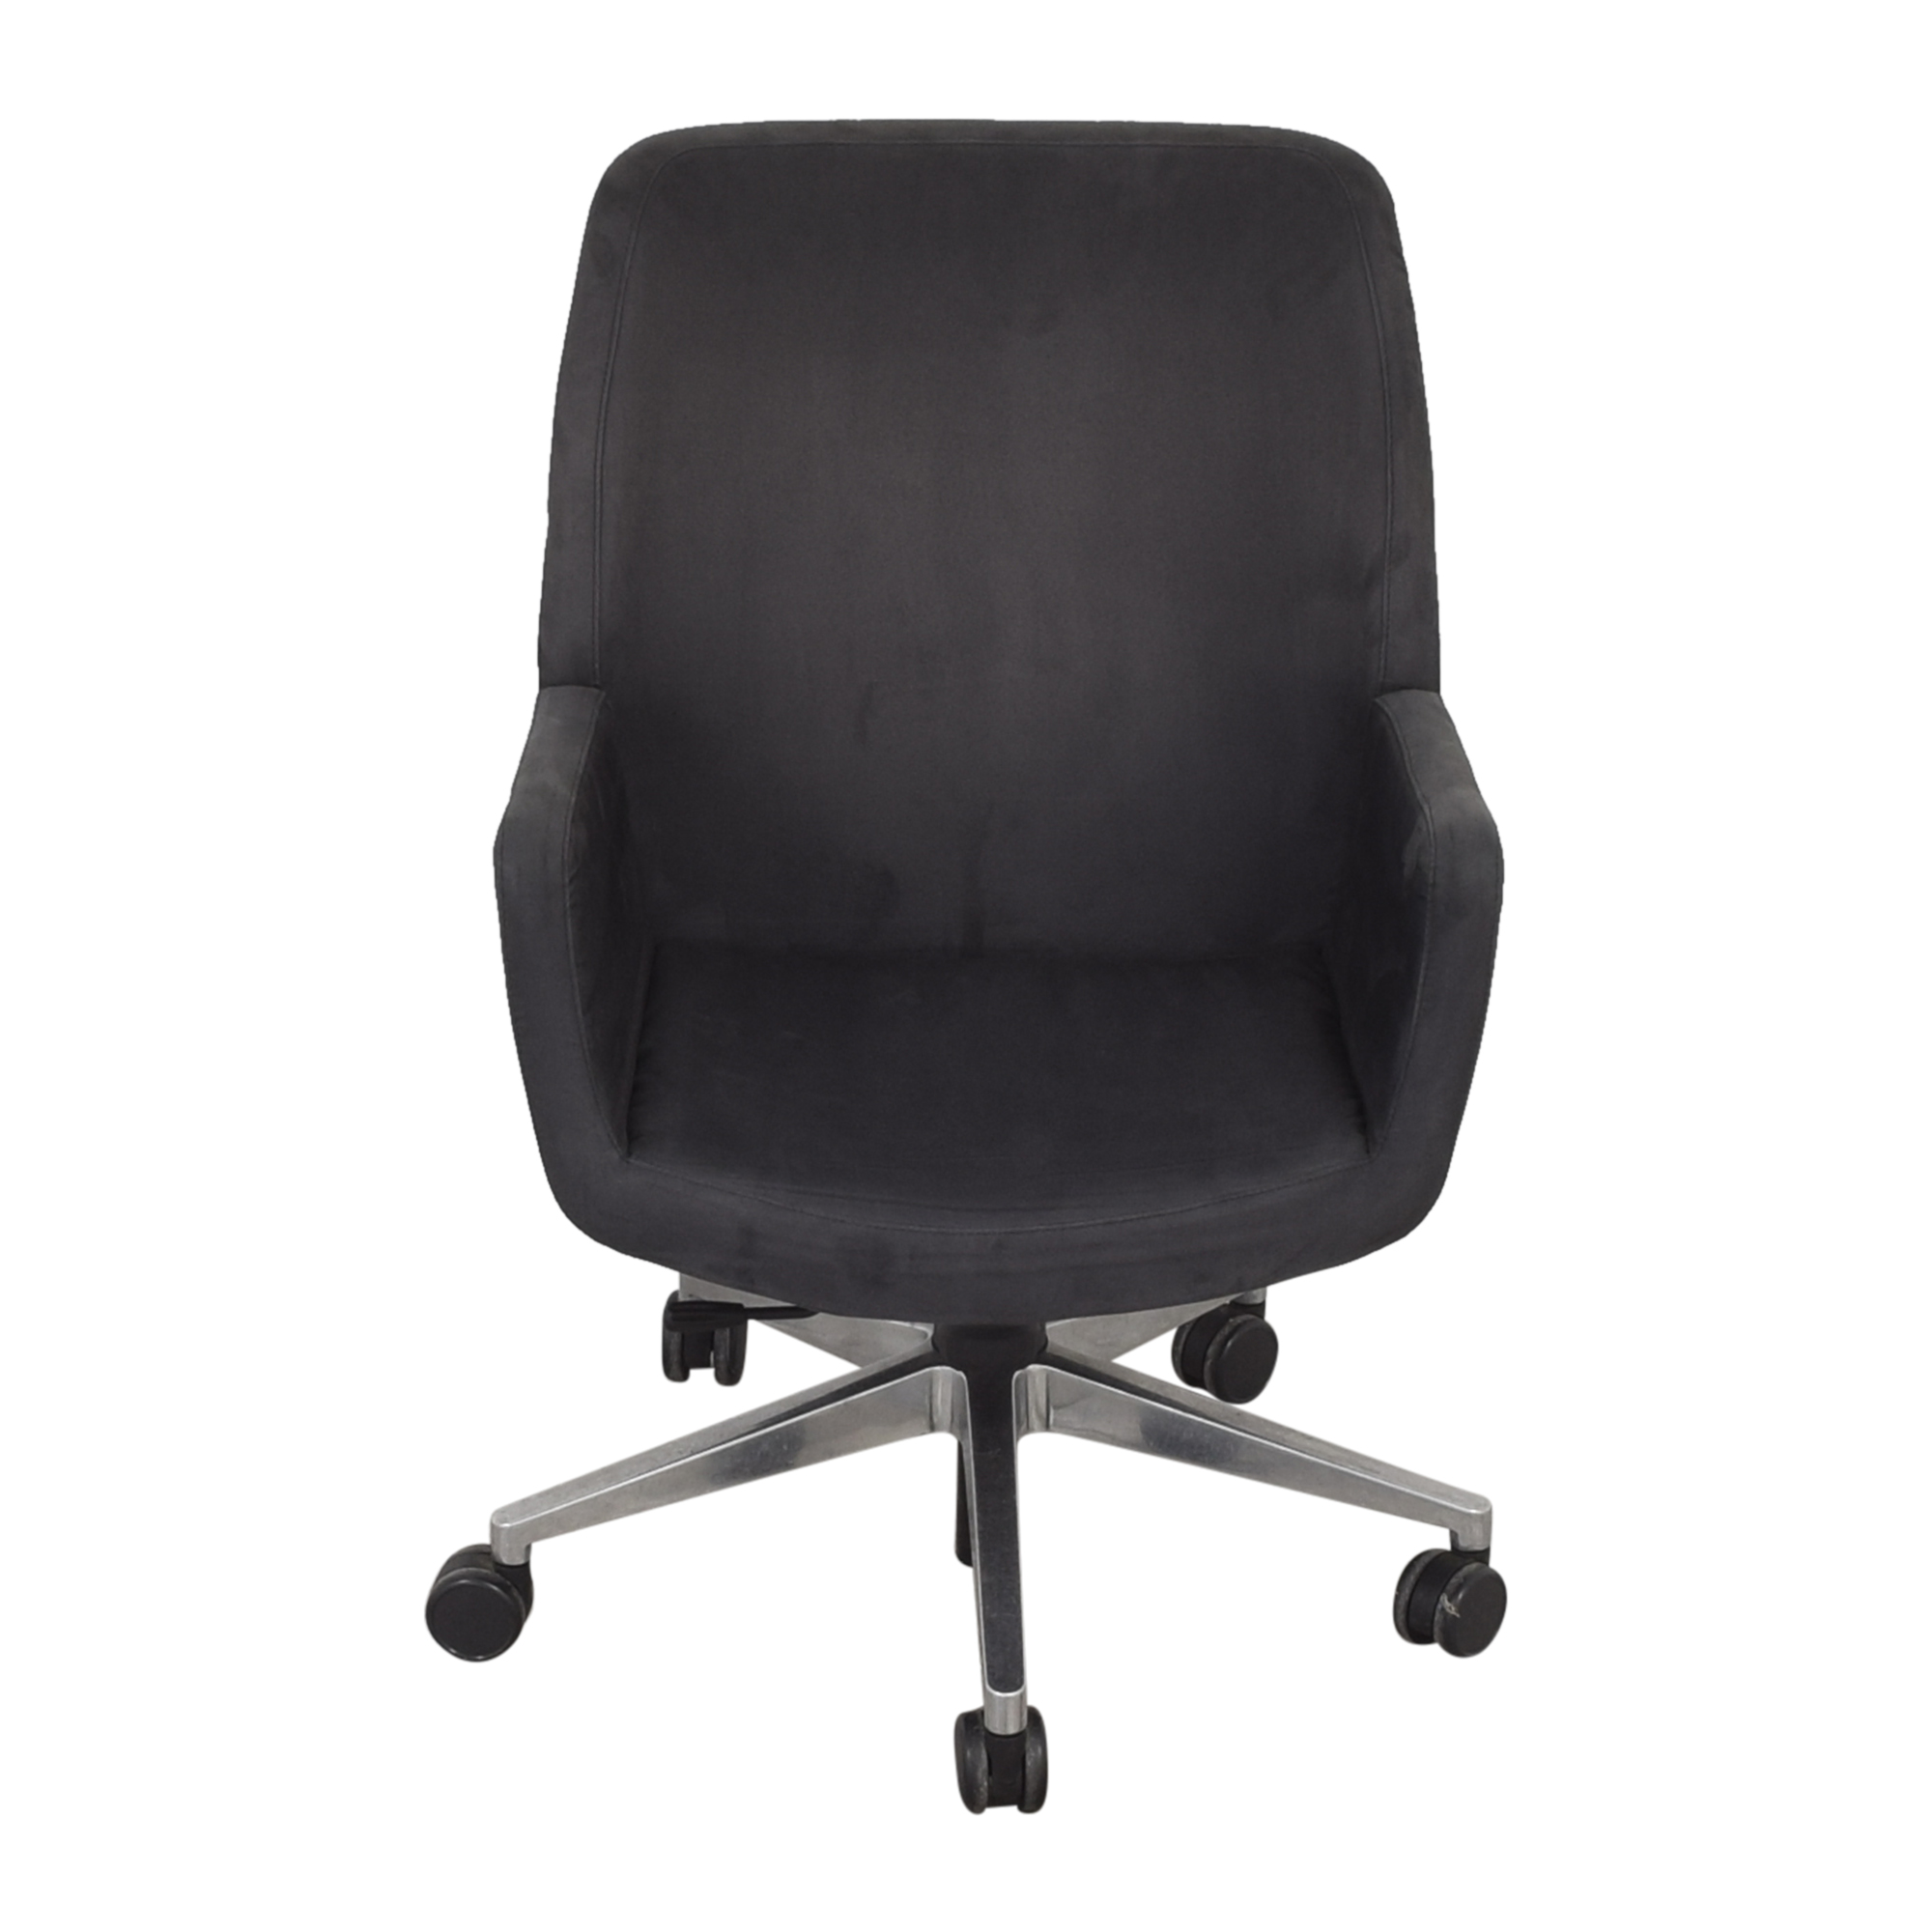 Steelcase Steelcase Coalesse Bindu Guest Chair coupon